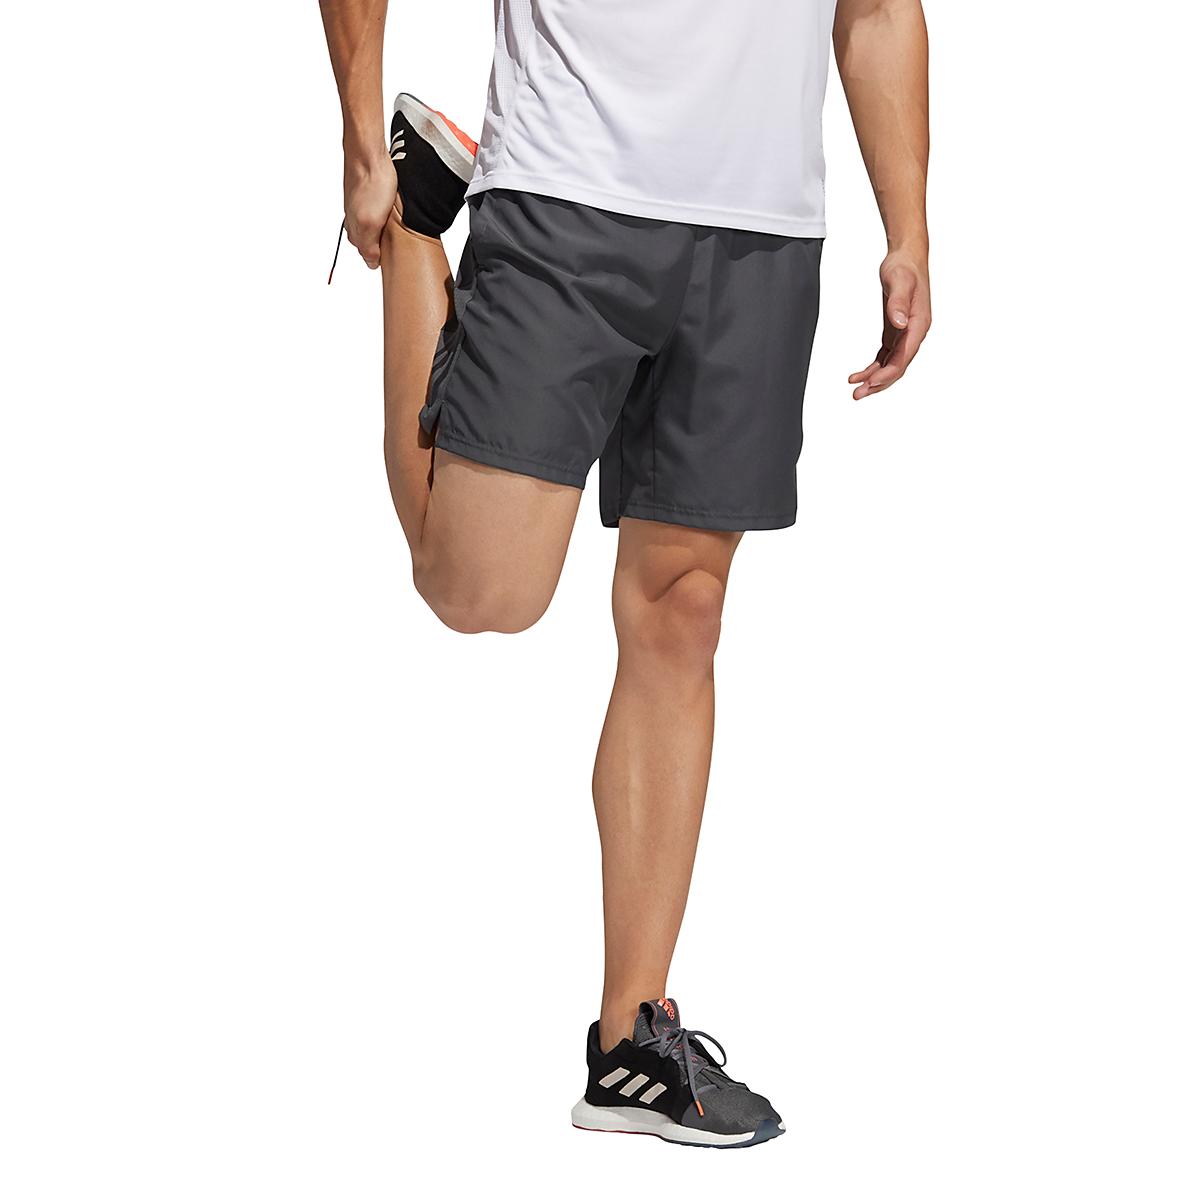 Men's Adidas Own The Run Shorts, , large, image 3